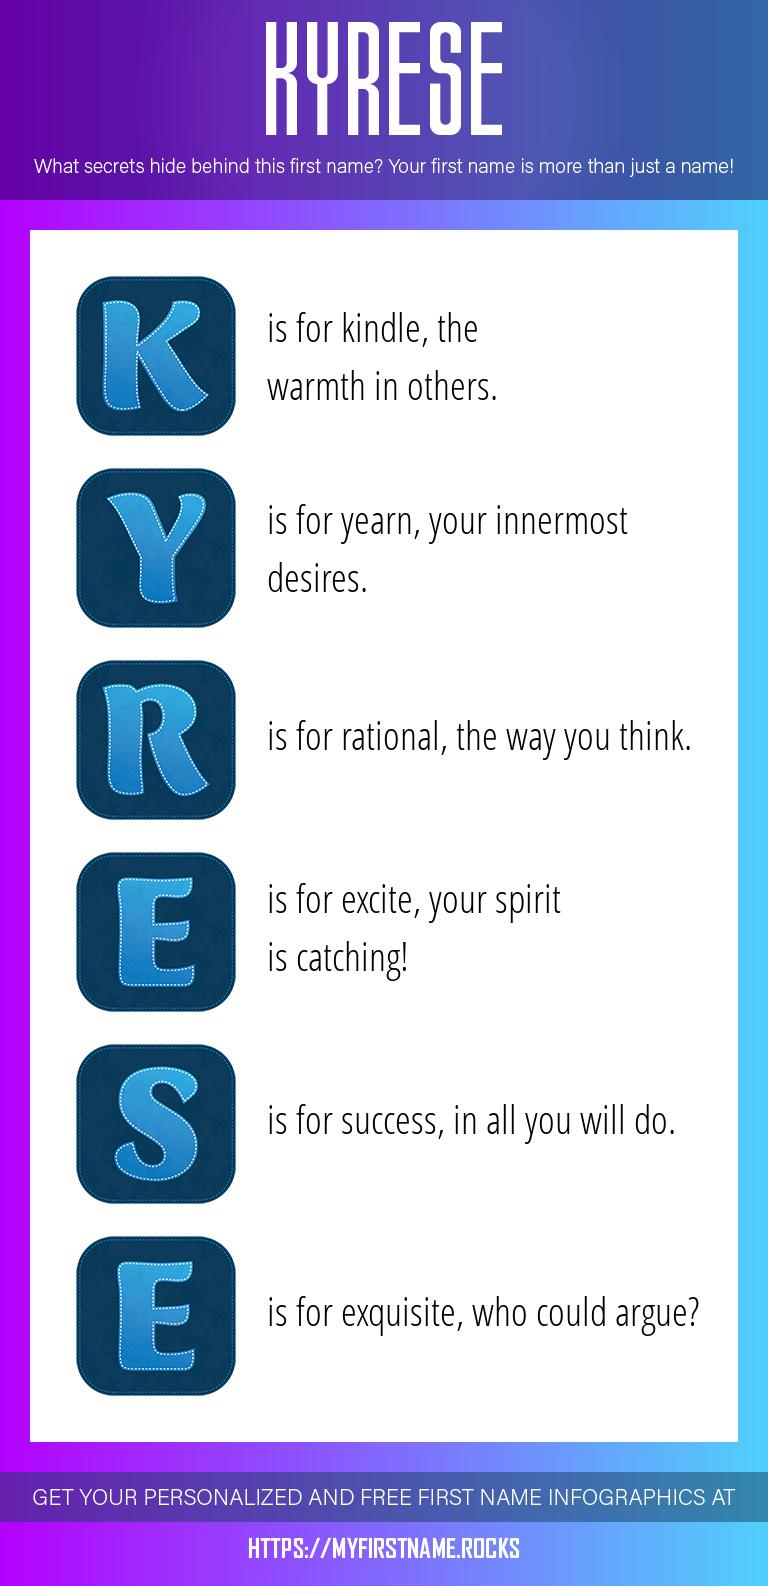 Kyrese Infographics